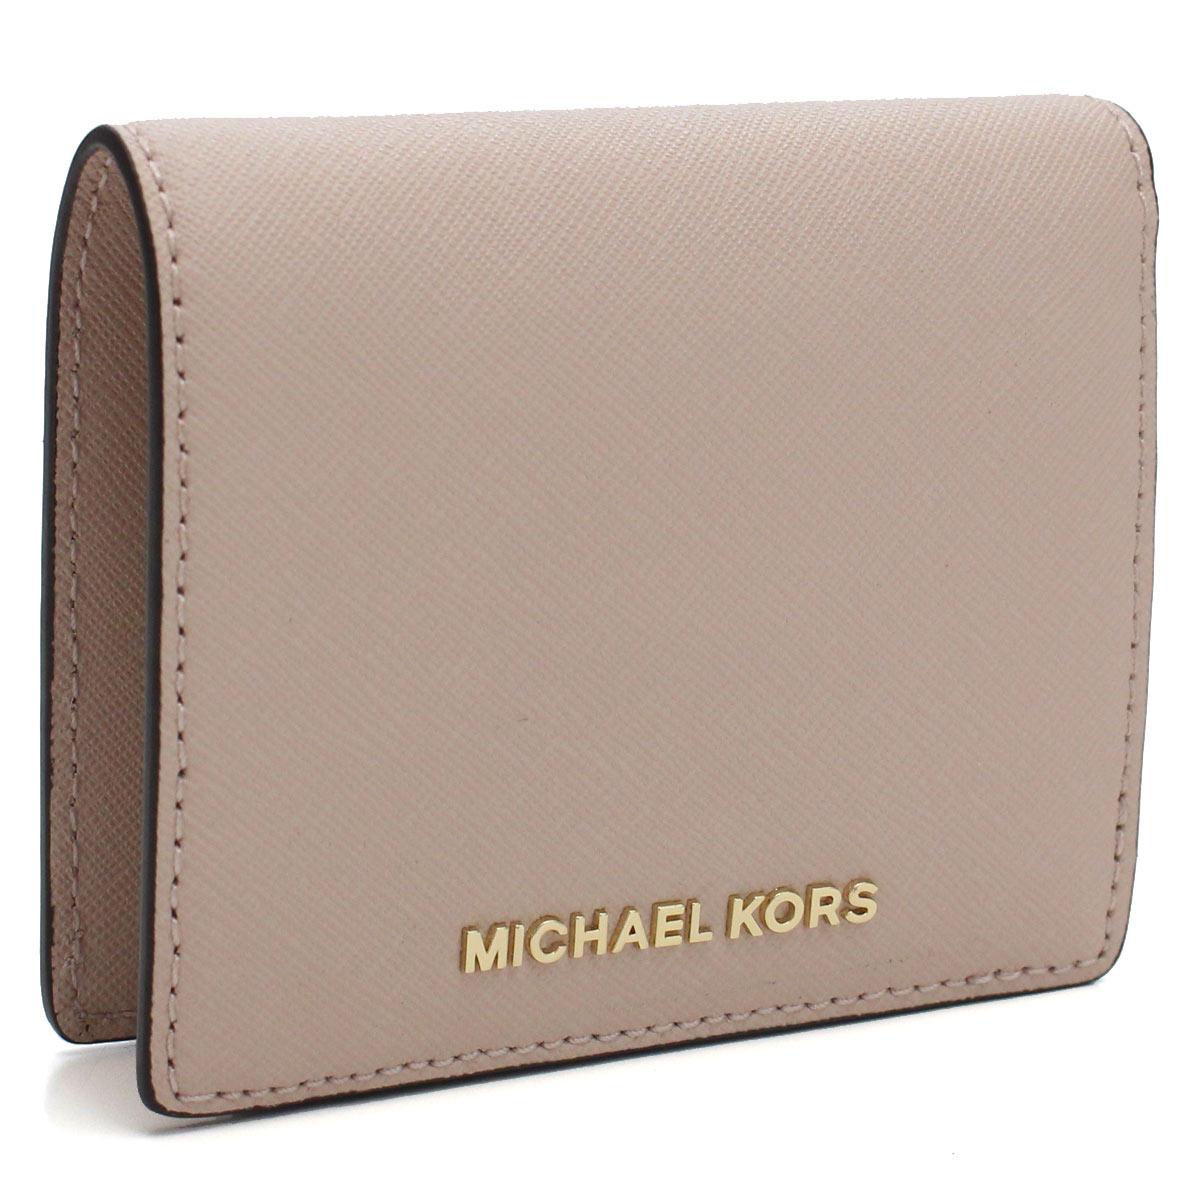 on sale bbbc3 b2f98 Michael Kors MICHAEL KORS MONEY PIECES card case 32T4GTVF2L SOFT PINK pink  system